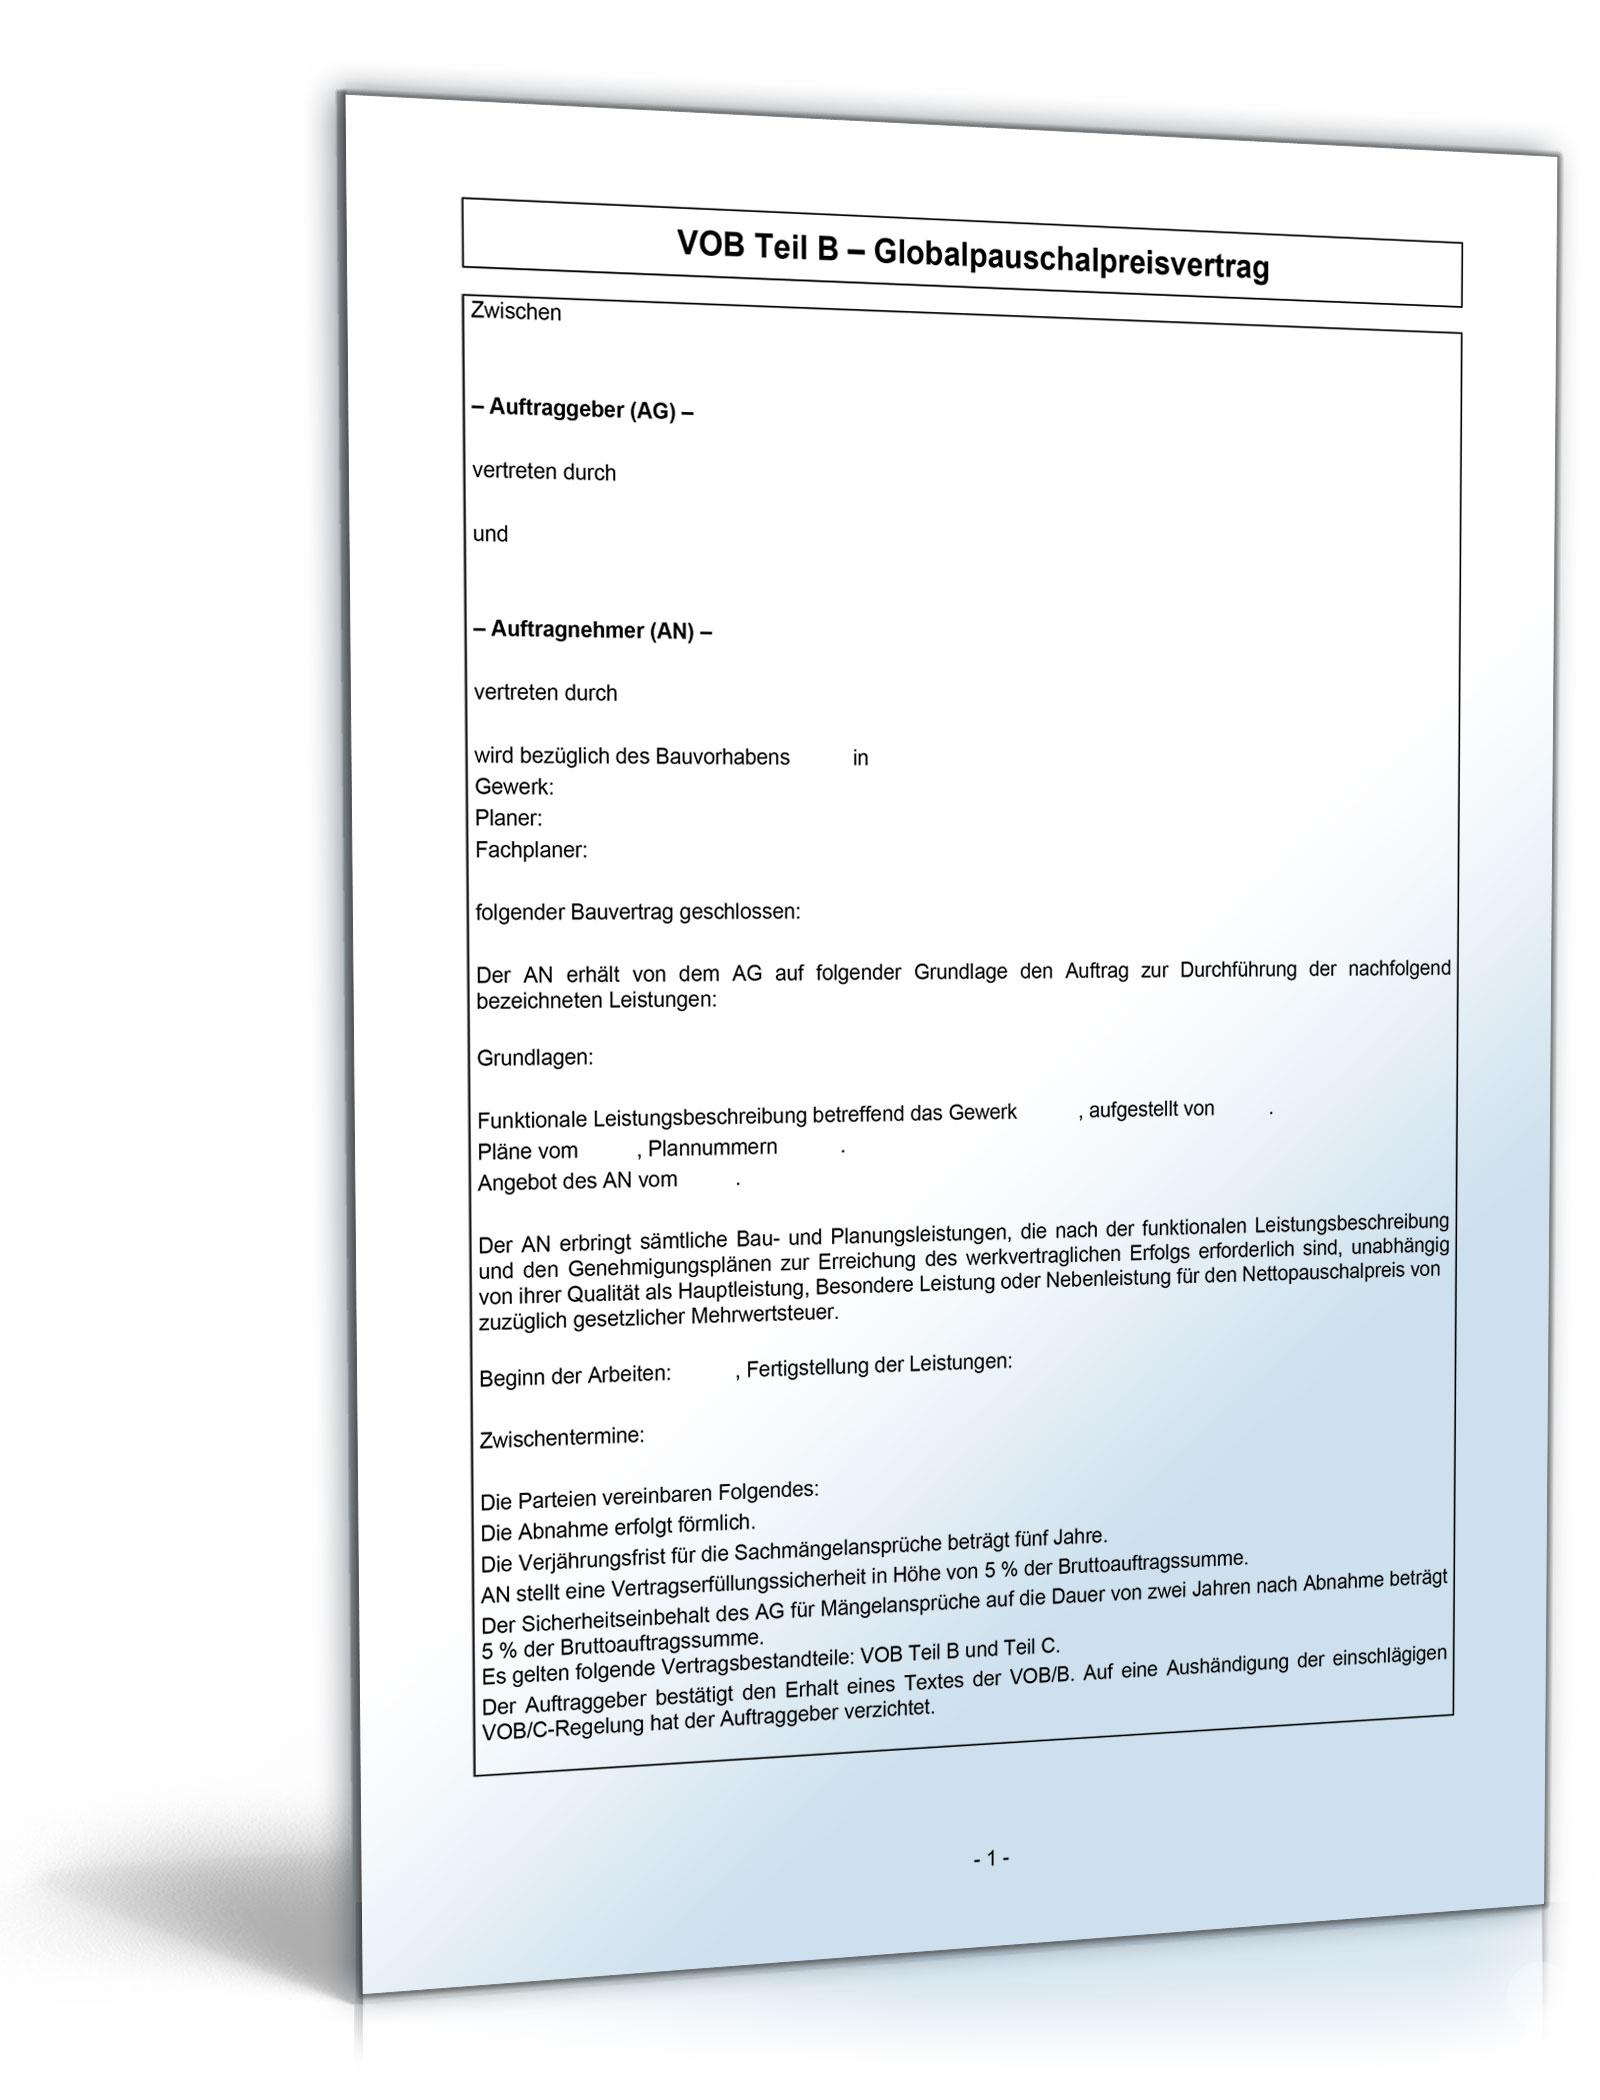 Vobb Bauvertrag Globalpauschalpreisvertrag Word Dokument